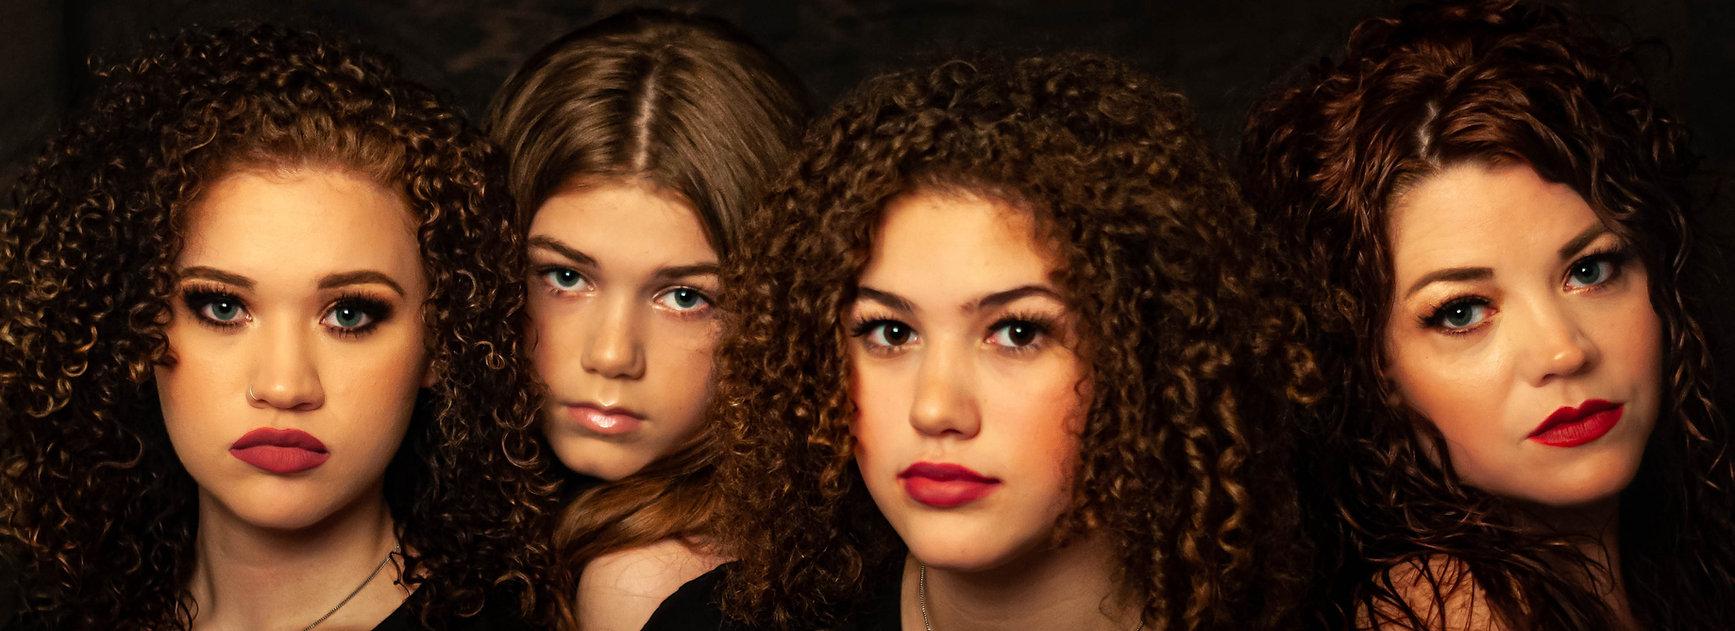 mom, daughters, curly hair, beautiful women, red lips, pink lips, Tiffany, Jaynlin, Gracelyn, Analyn